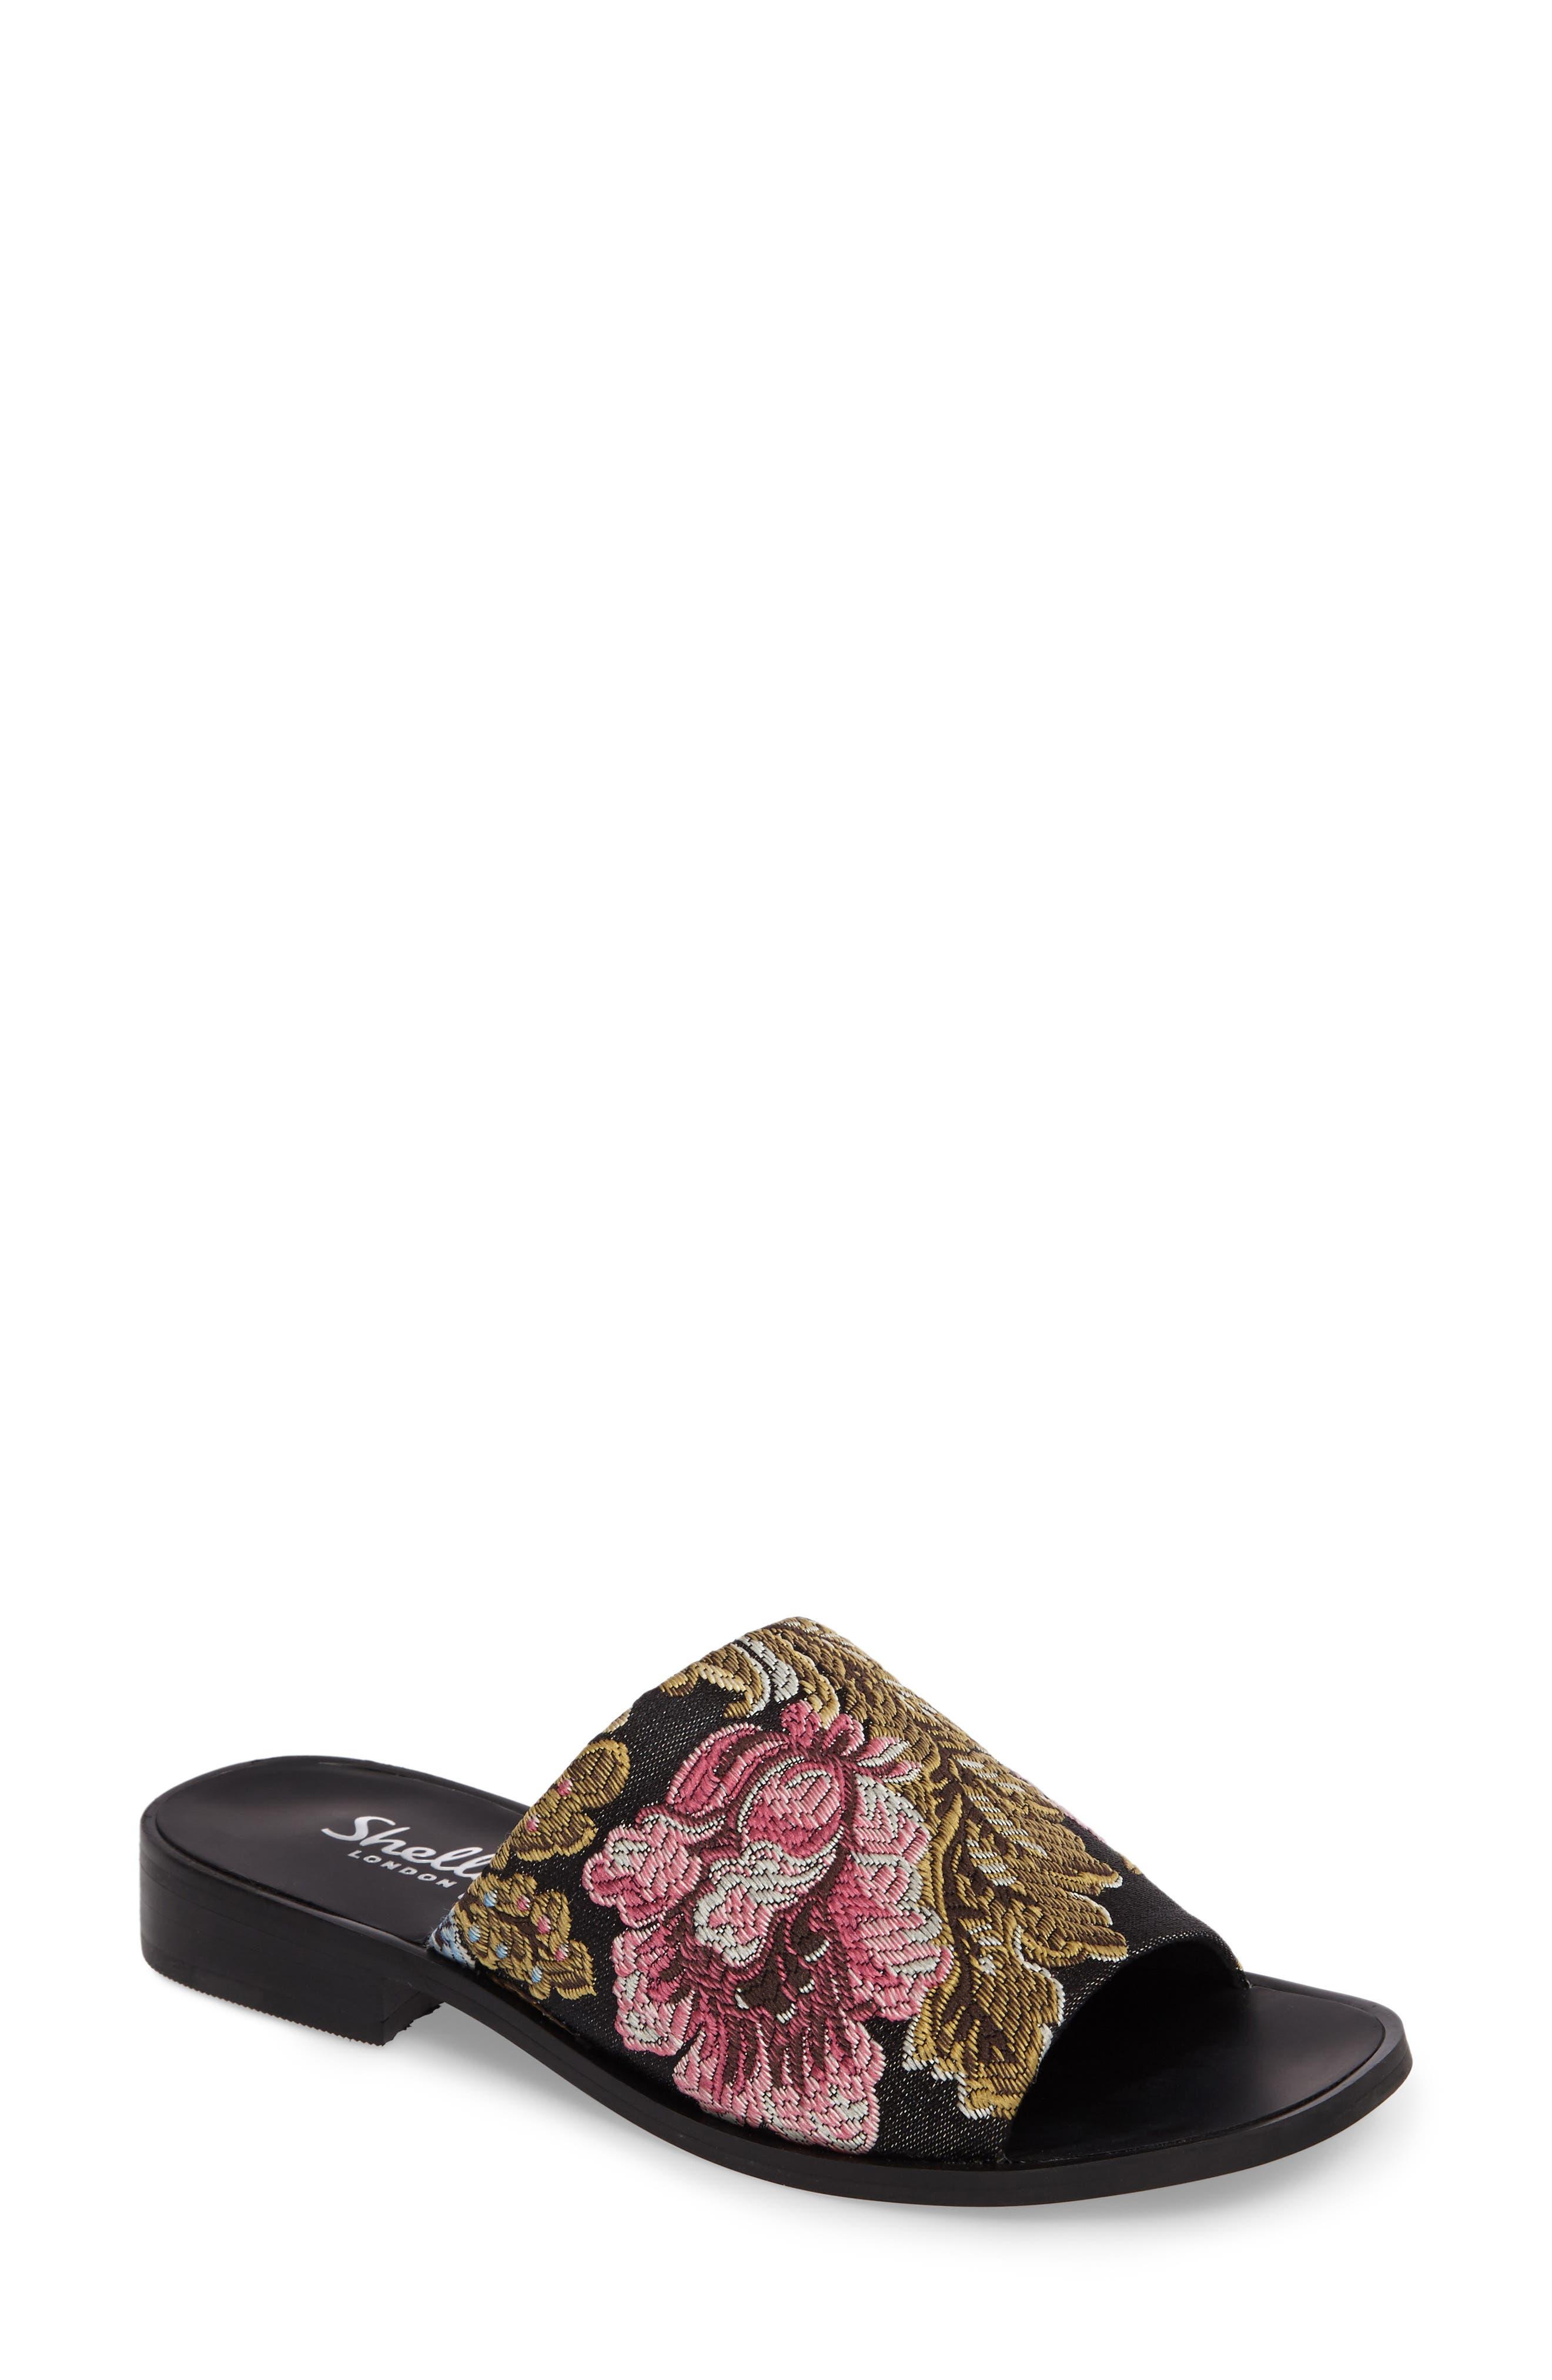 Enya Brocade Slide Sandal,                         Main,                         color, 001